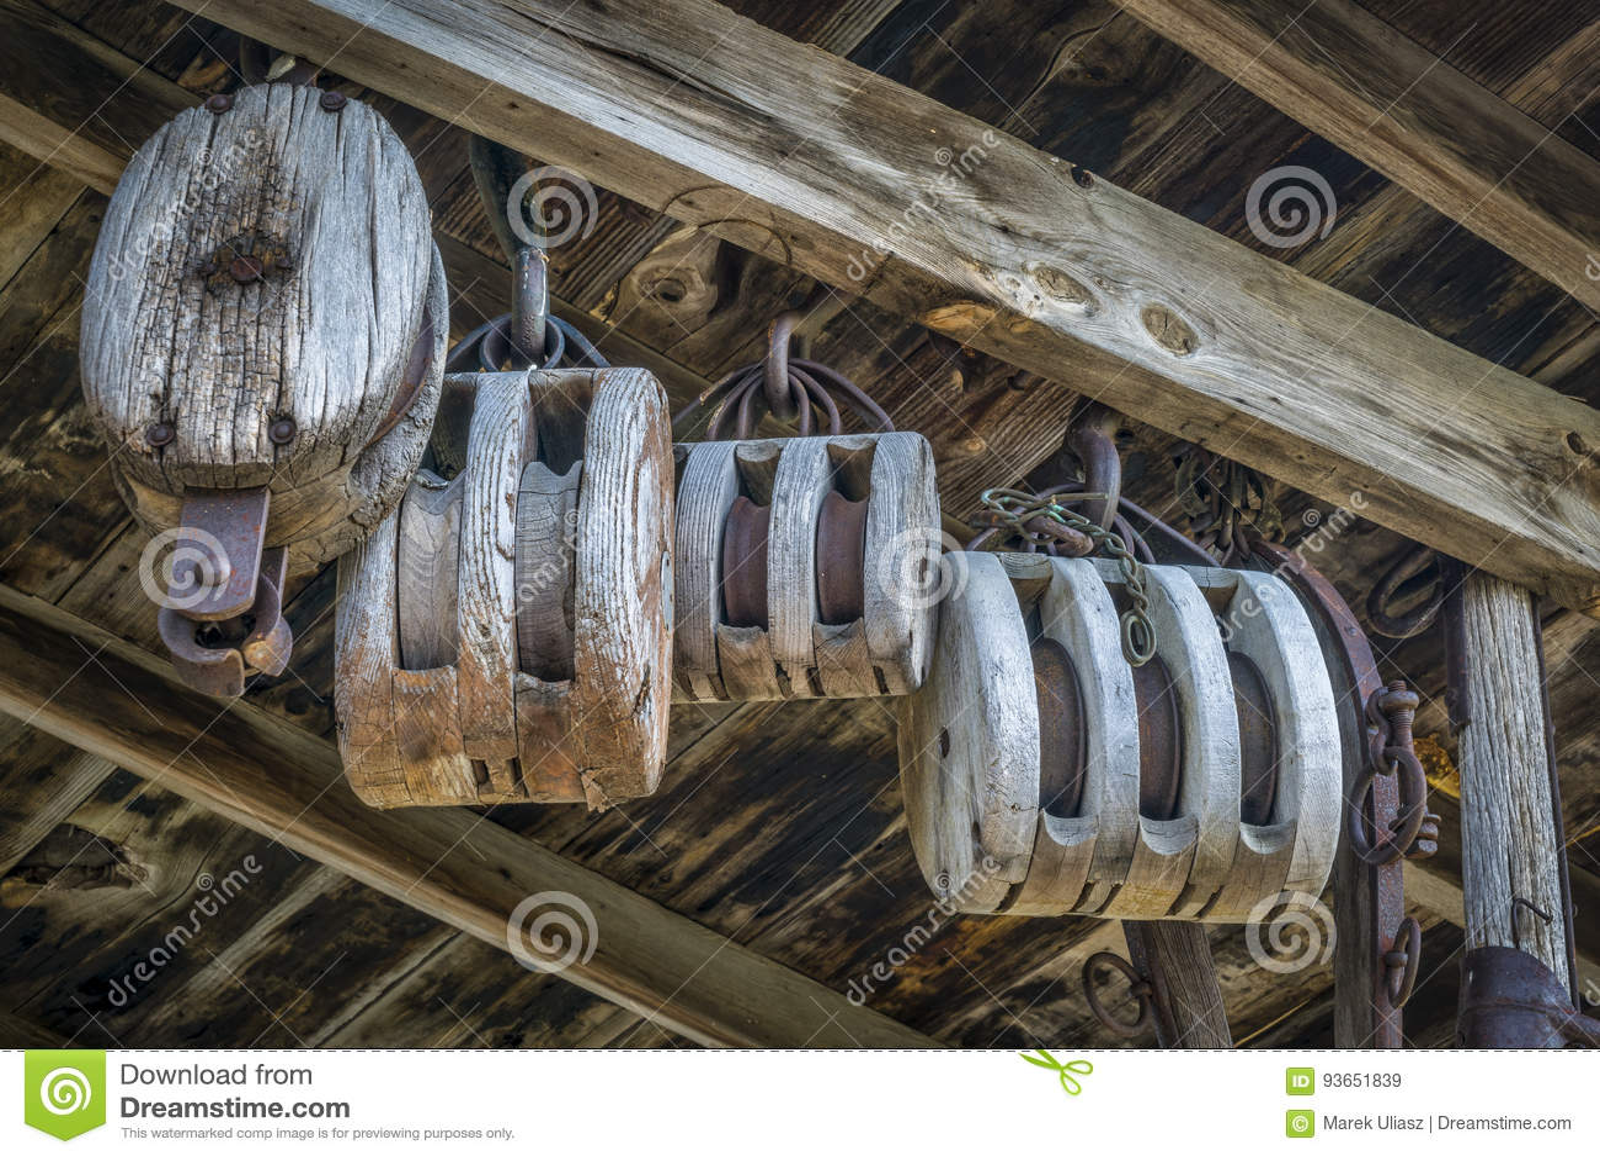 Vintage barn wooden pulleys